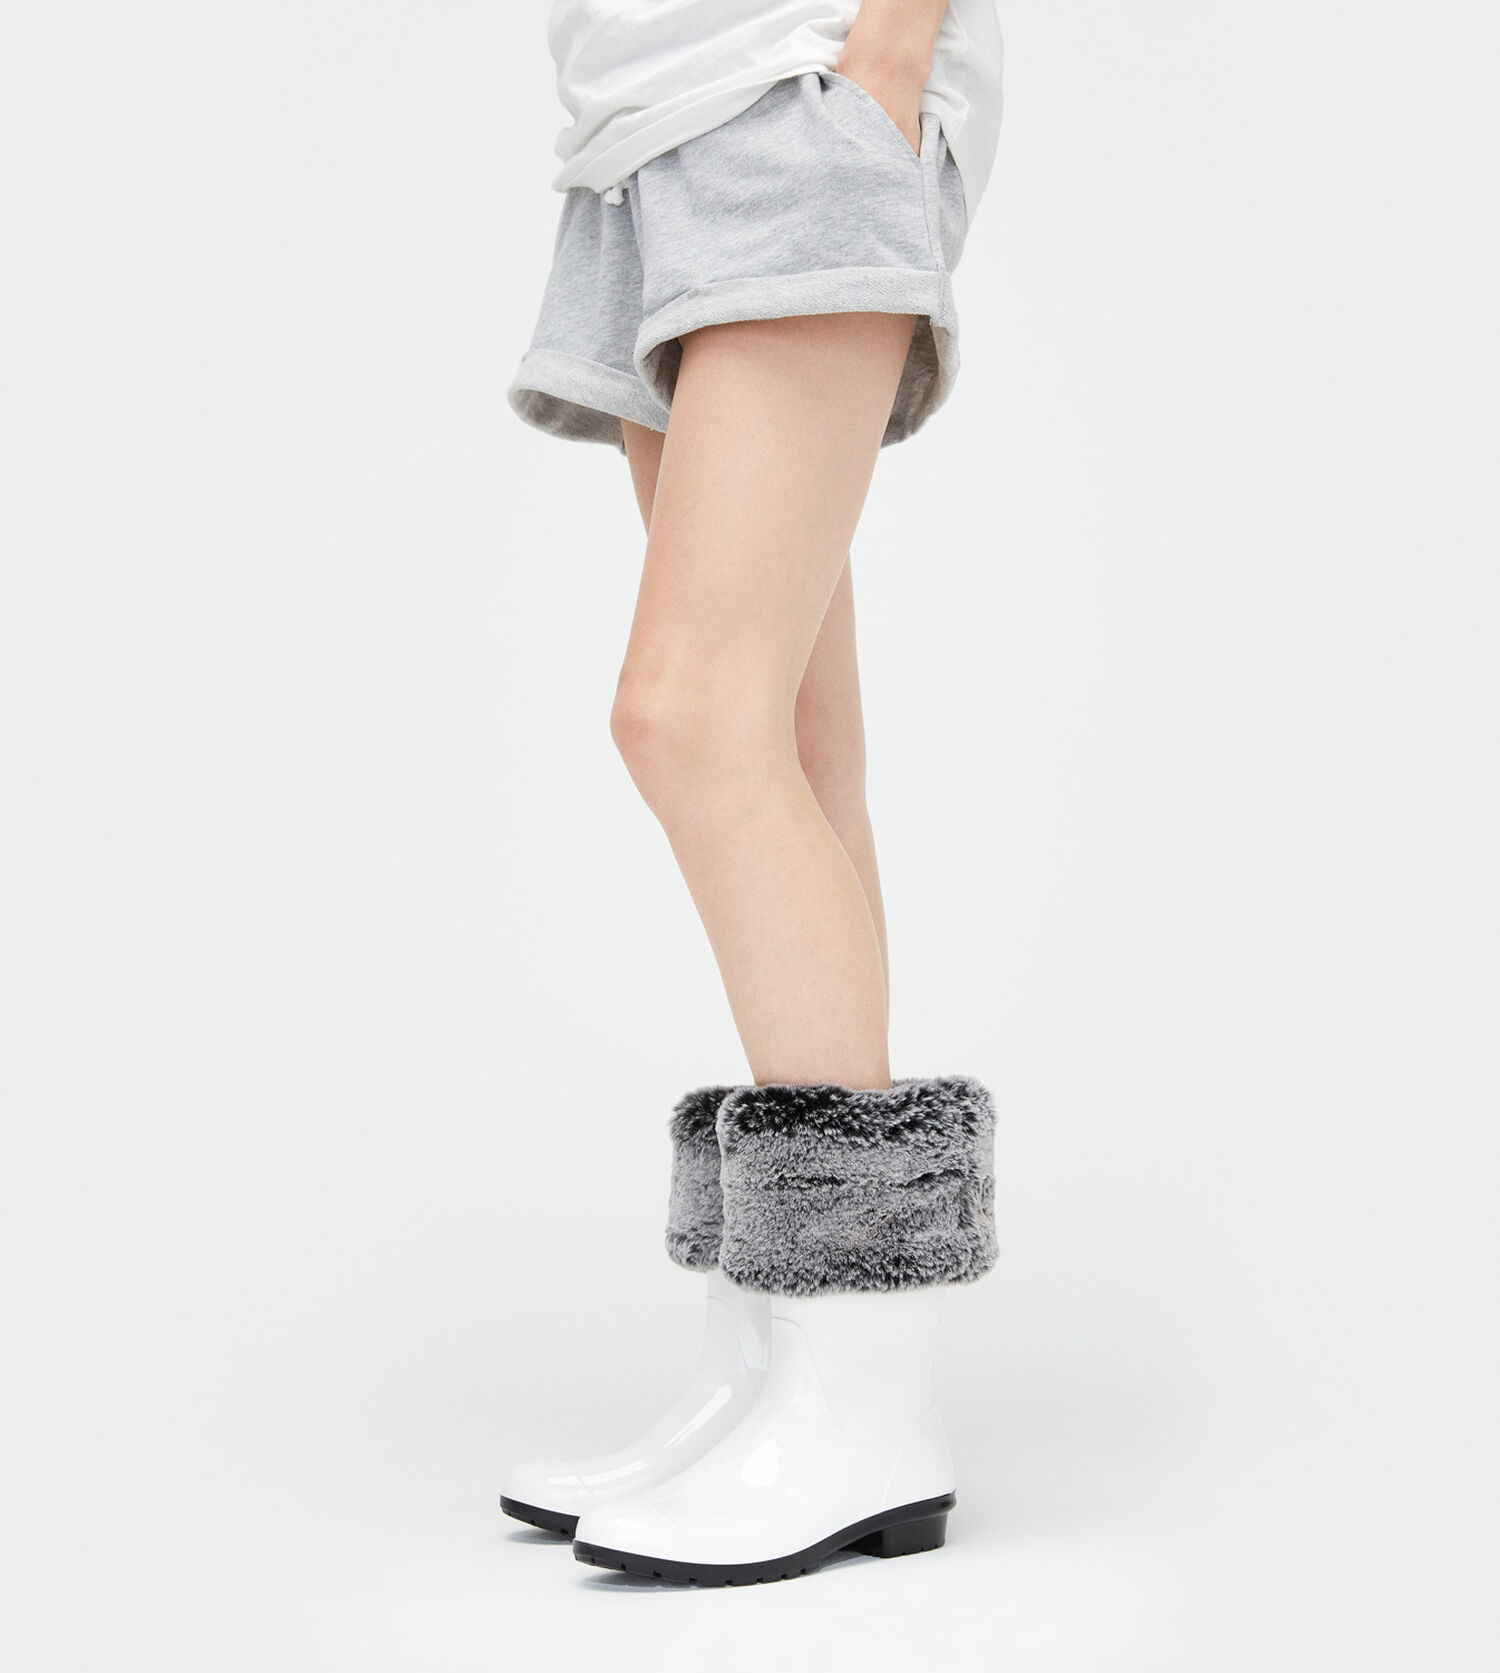 c1a68b2d4d8 Women's Share this product Faux Fur Short Rainboot Sock